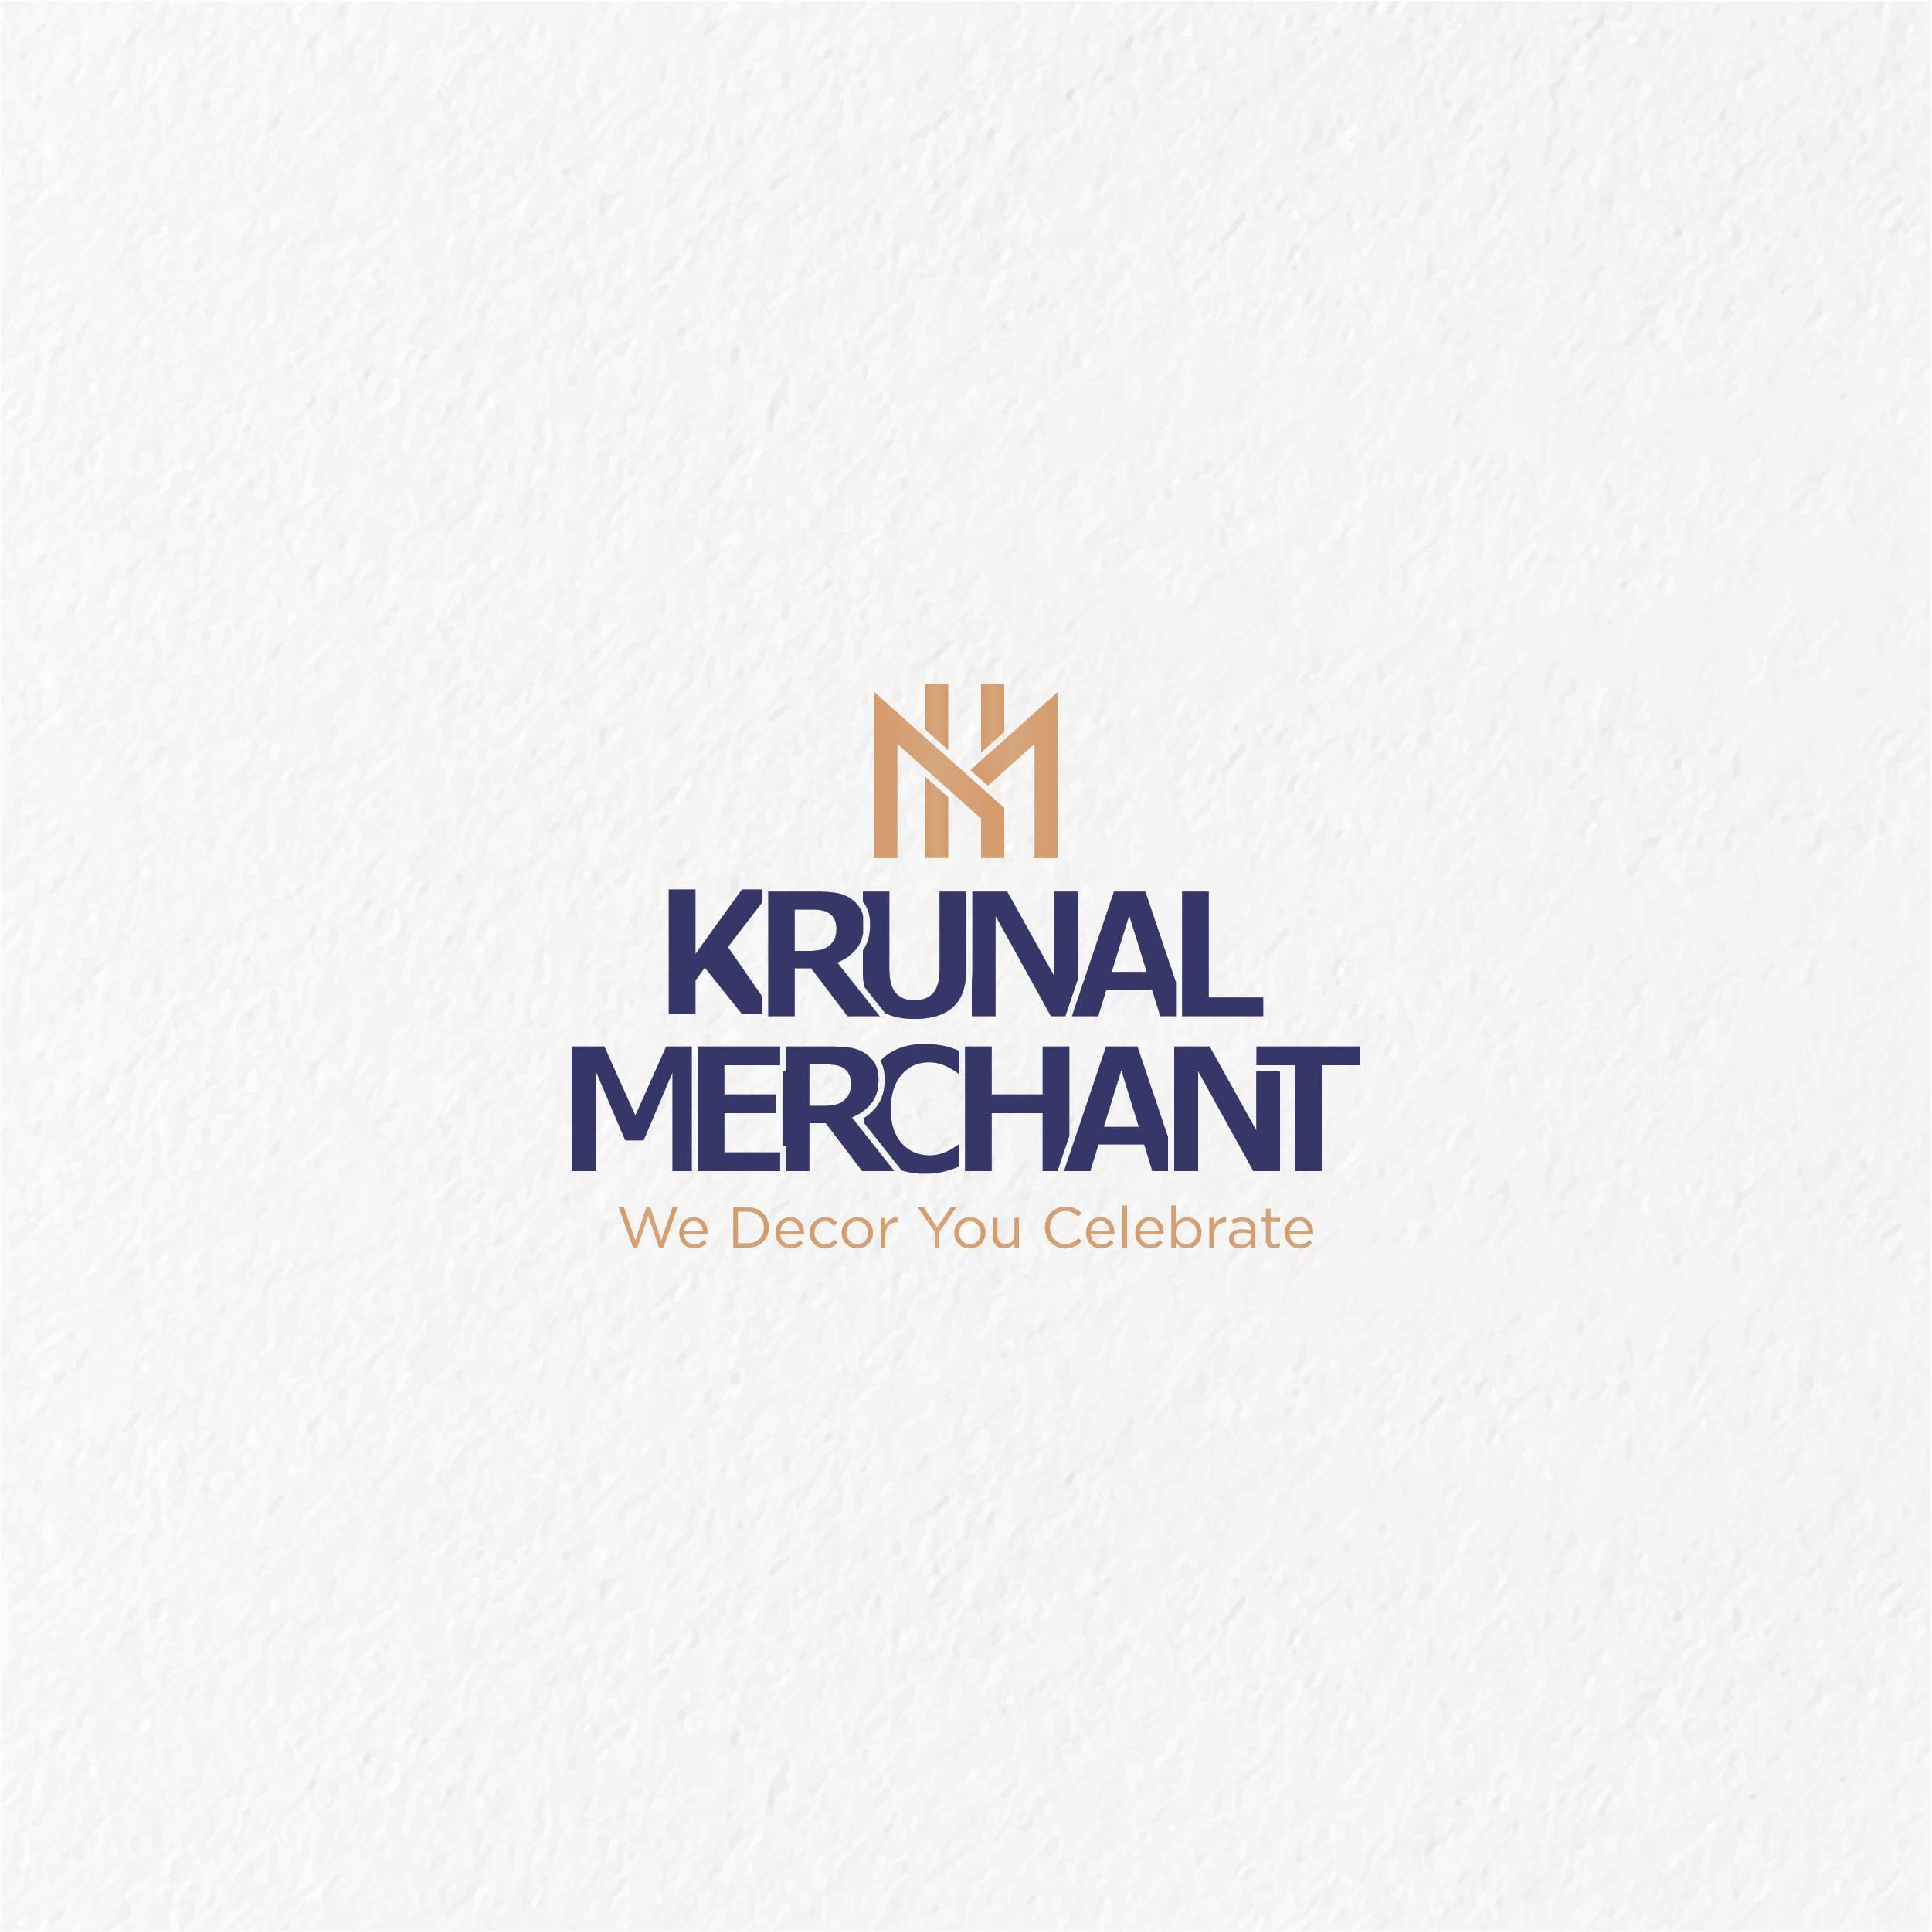 KRUNAL MERCHANT_Final logo_instagram-11-min